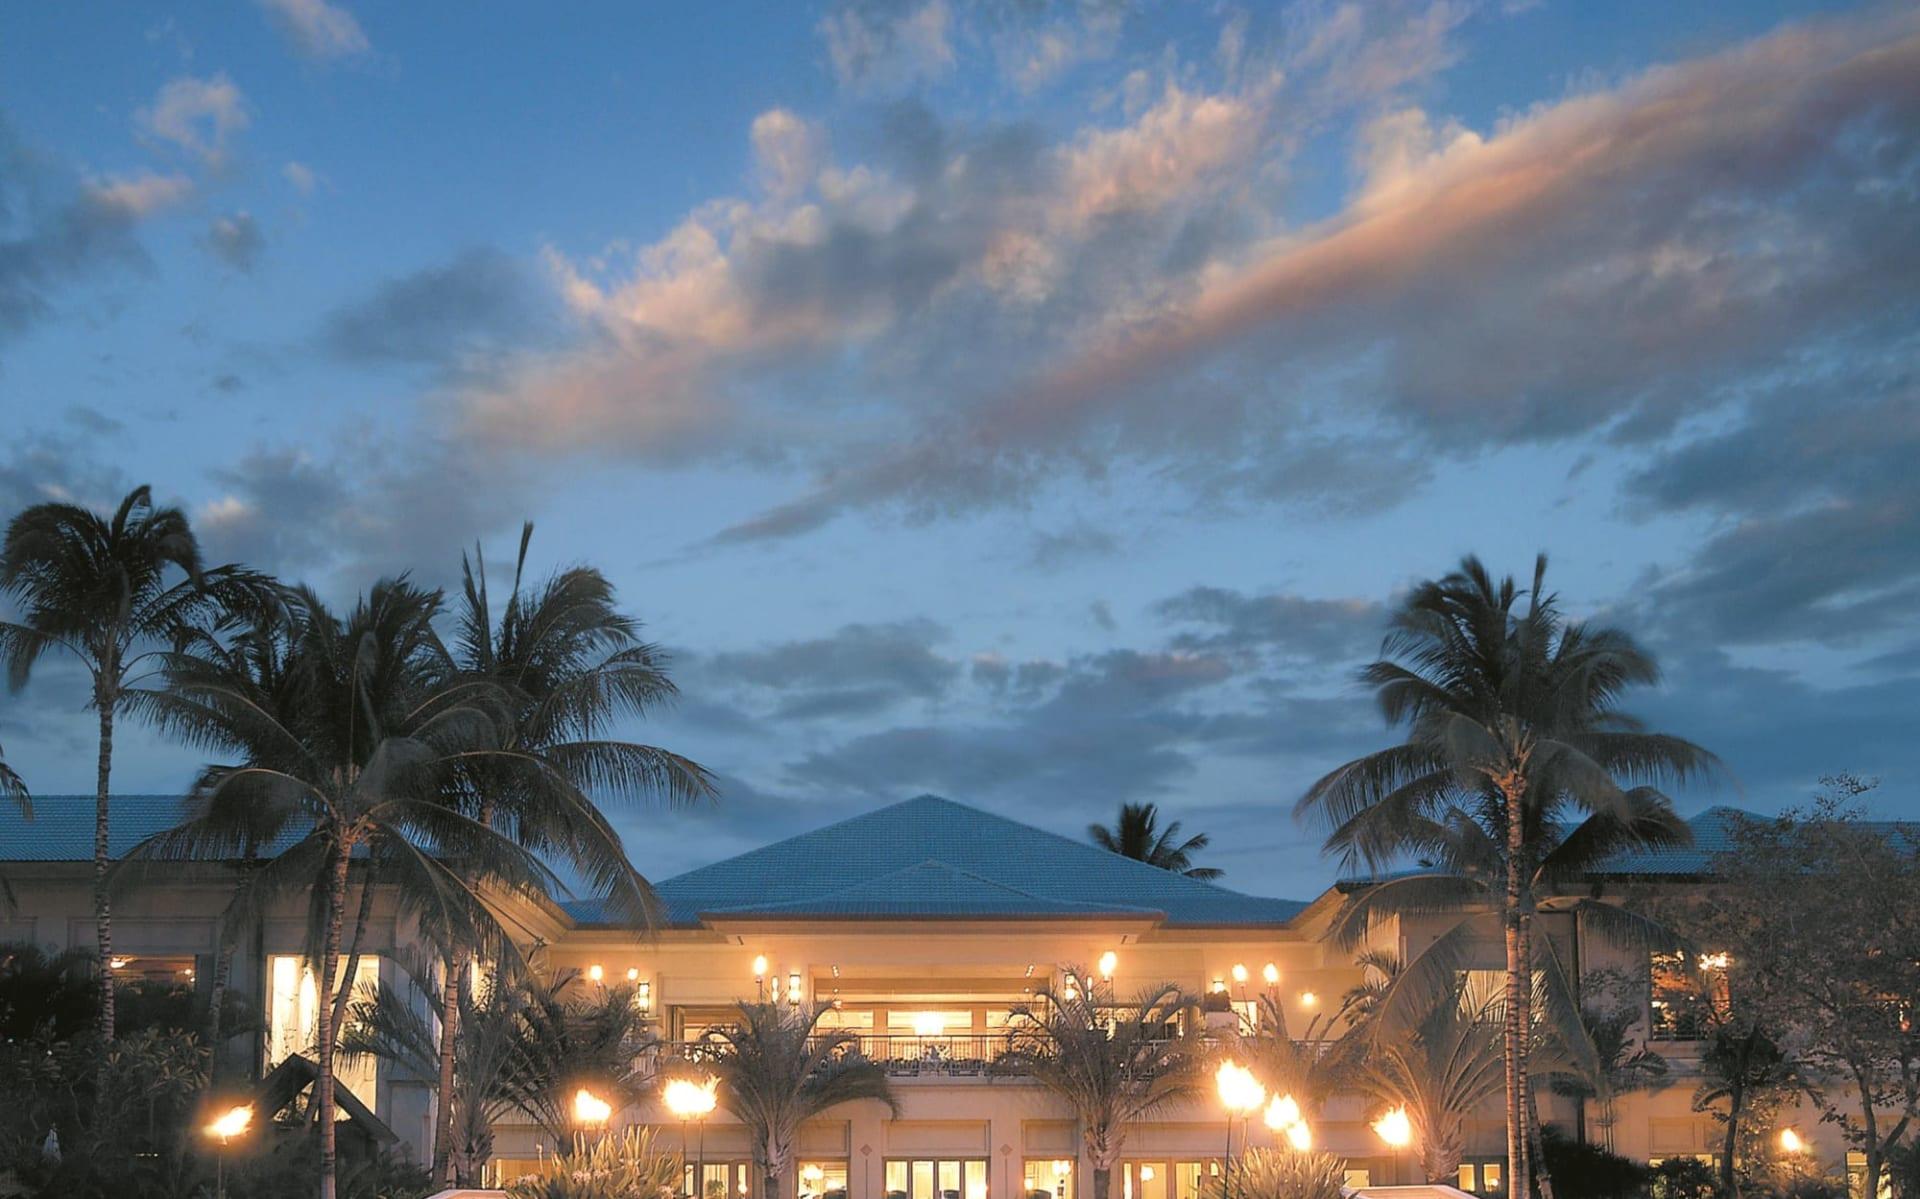 Fairmont Orchid in Waikoloa: Exterior_Fairmont Orchid_Hotel_BON